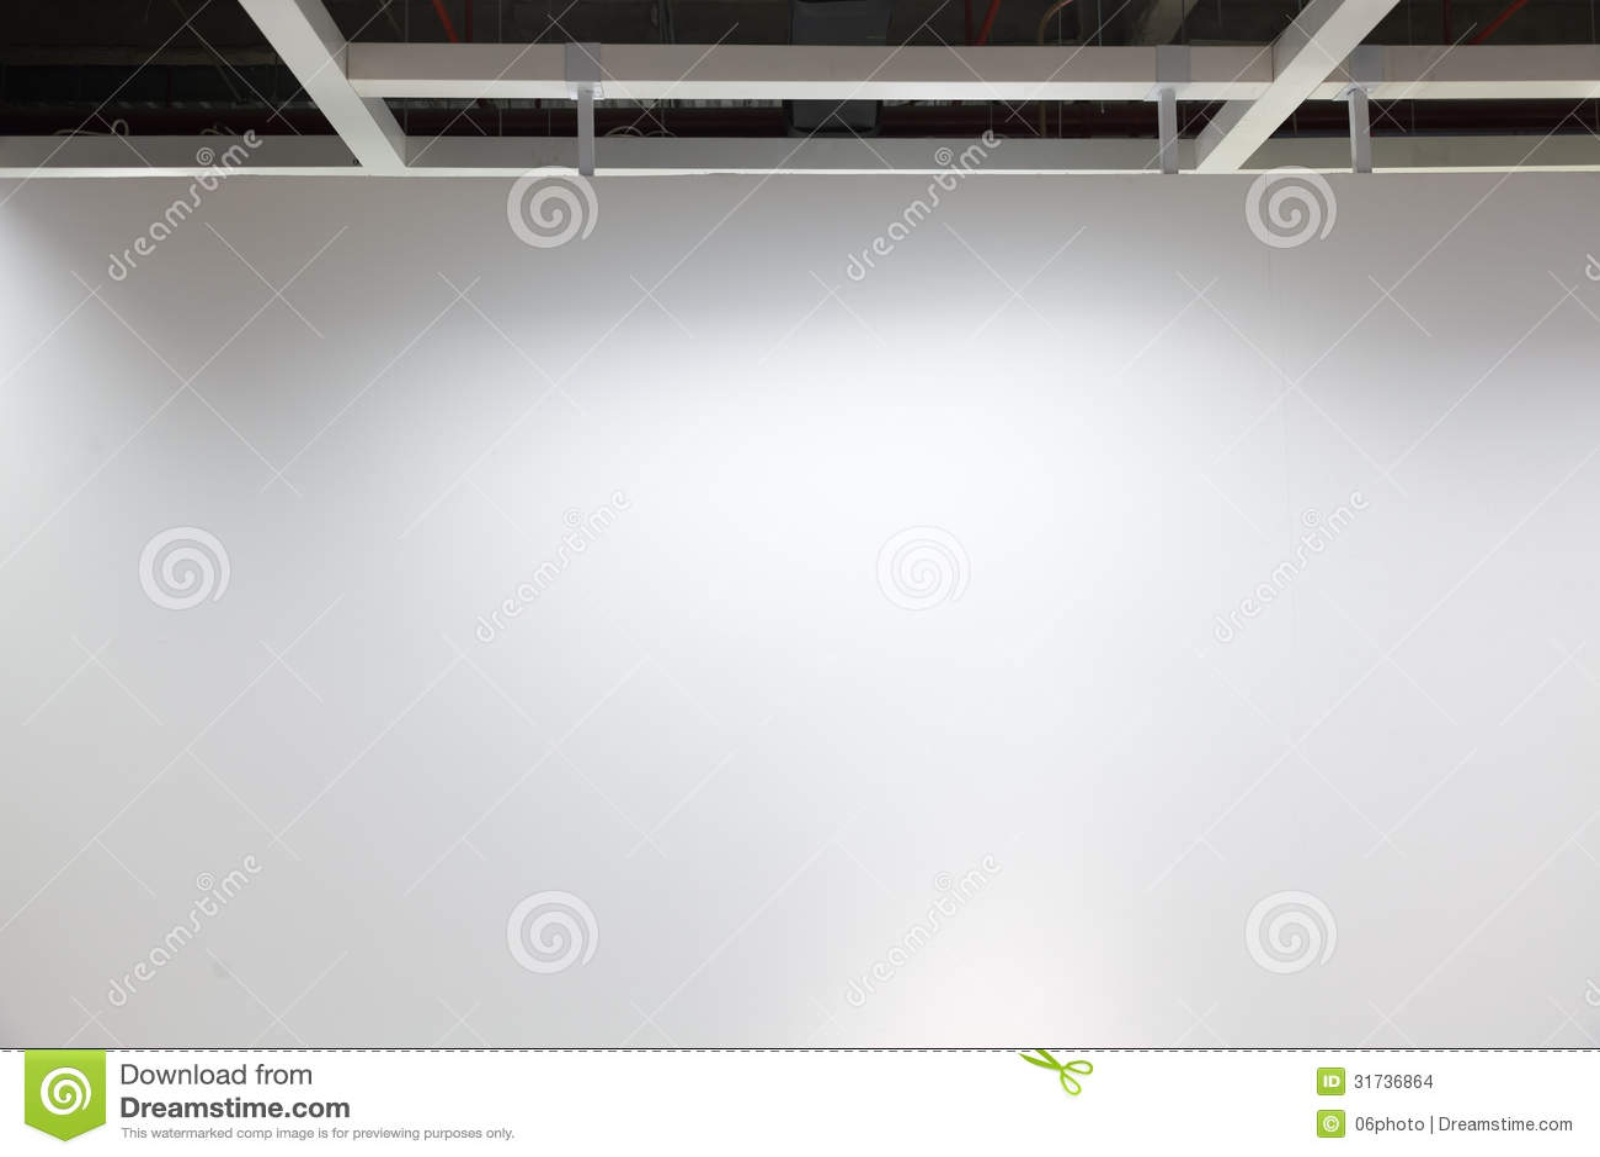 Empty modern shop with illumination wall